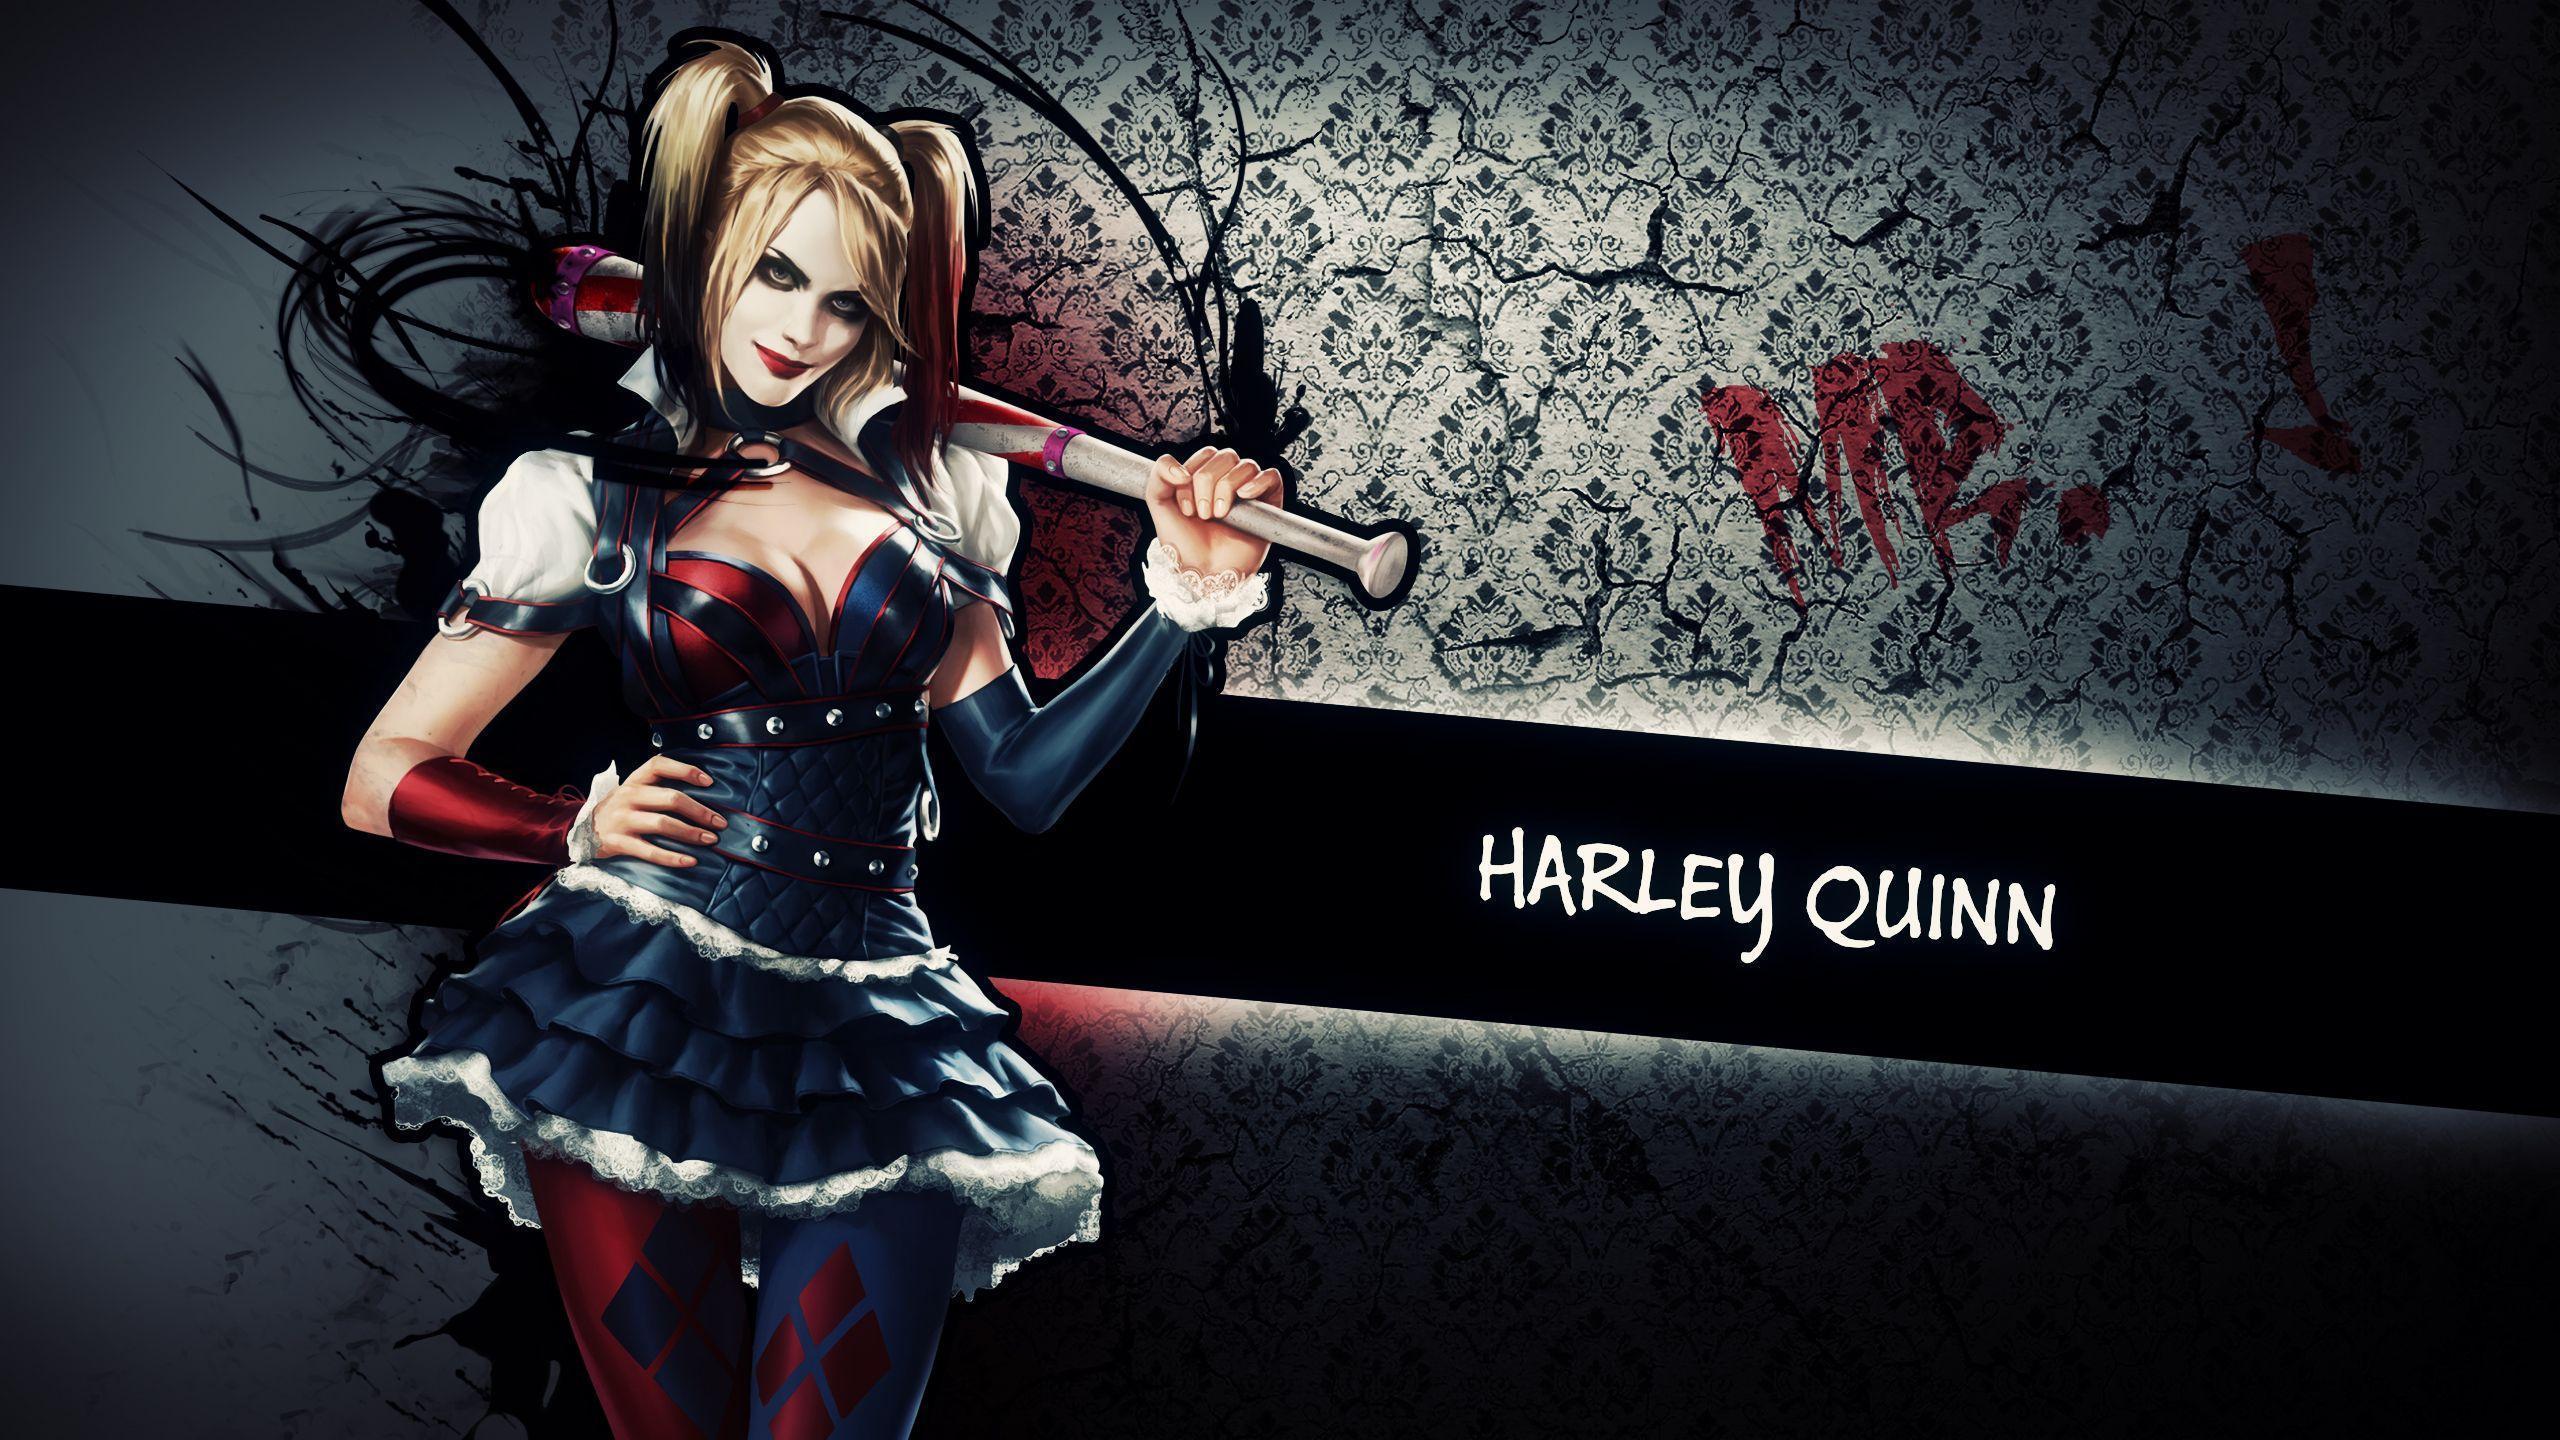 Harley Quinn Supervillain Wallpapers - Wallpaper Cave